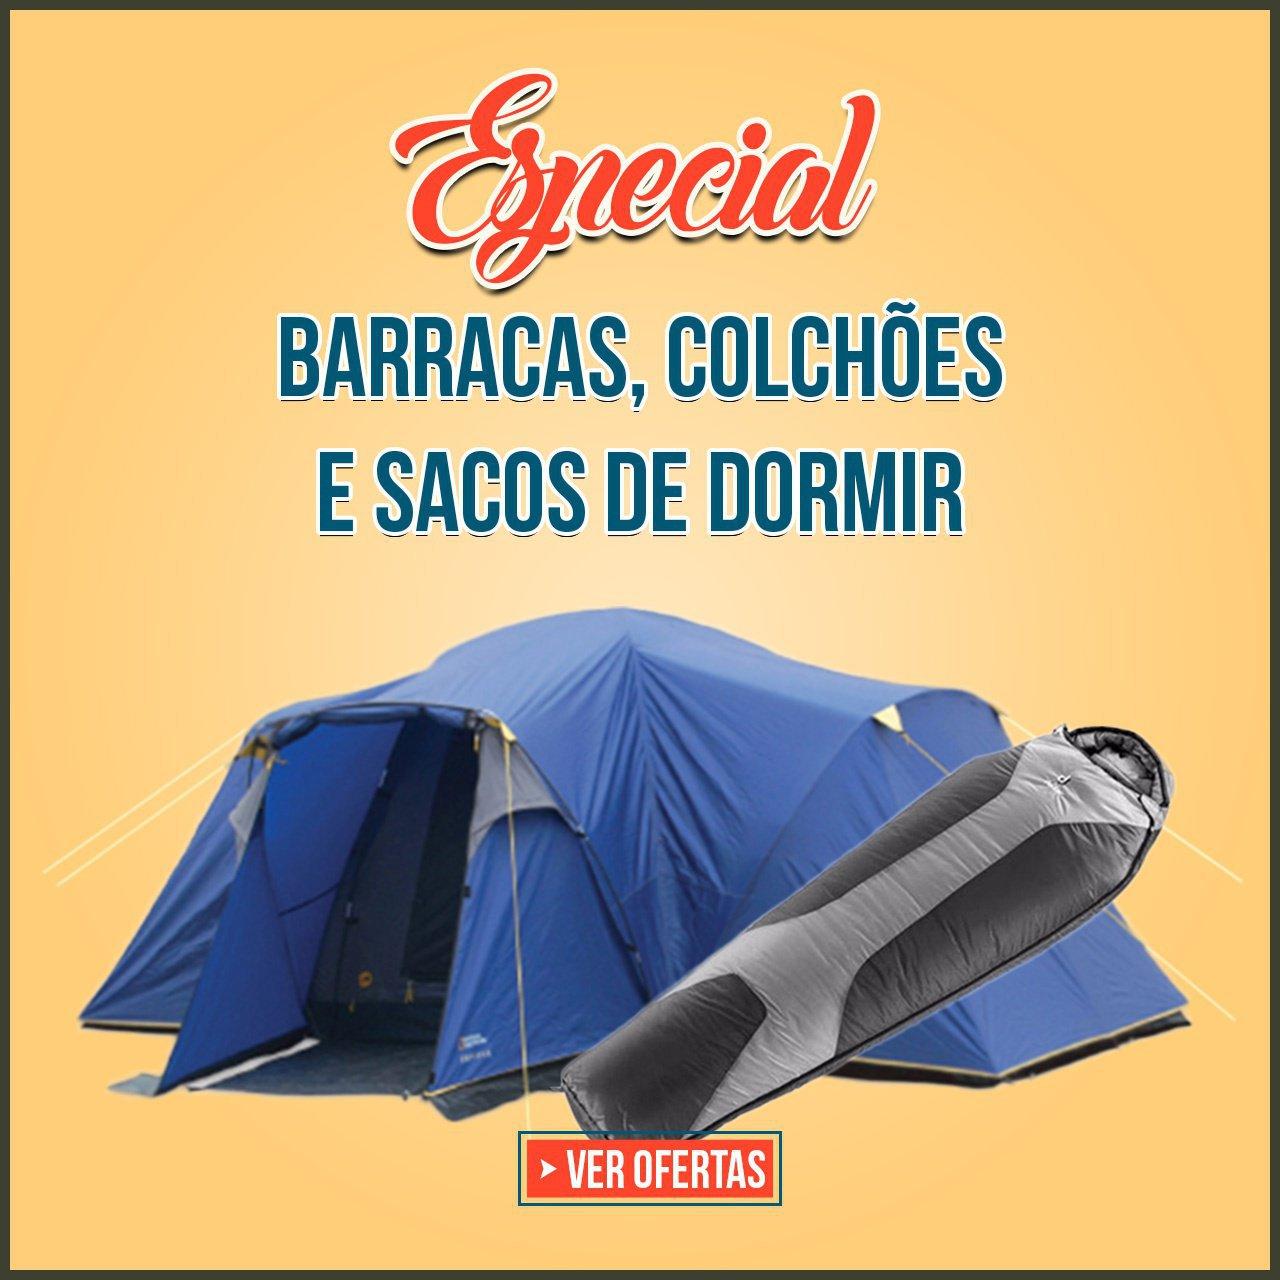 ESPECIAL BARRACAS, COLCHOES E SACOS DE DORMIR